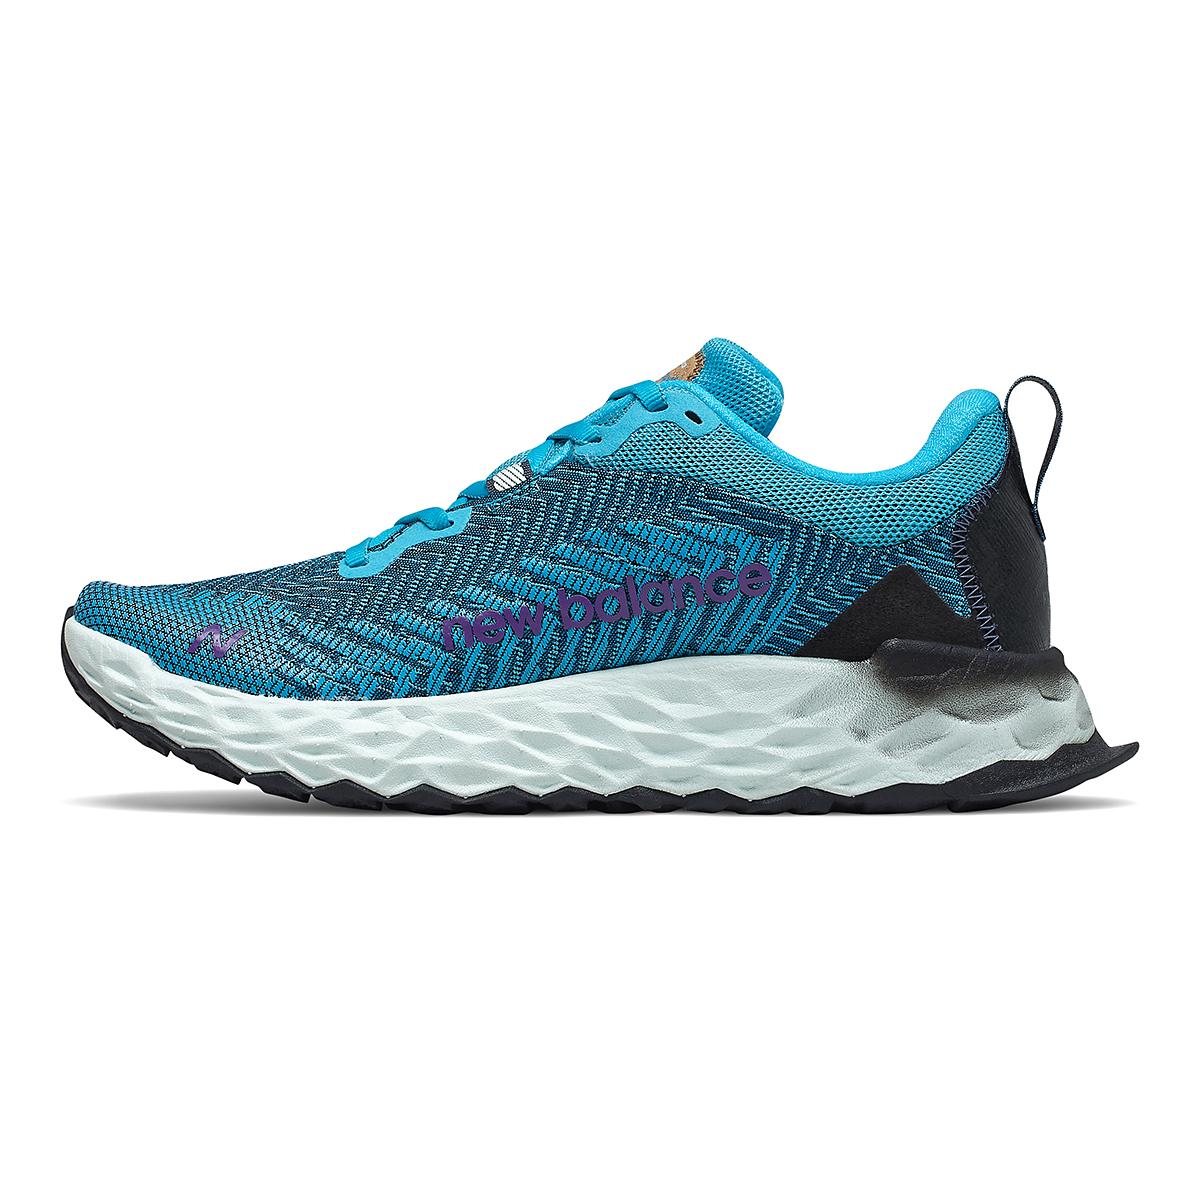 Women's New Balance Hierro V6 Trail Running Shoe, , large, image 2